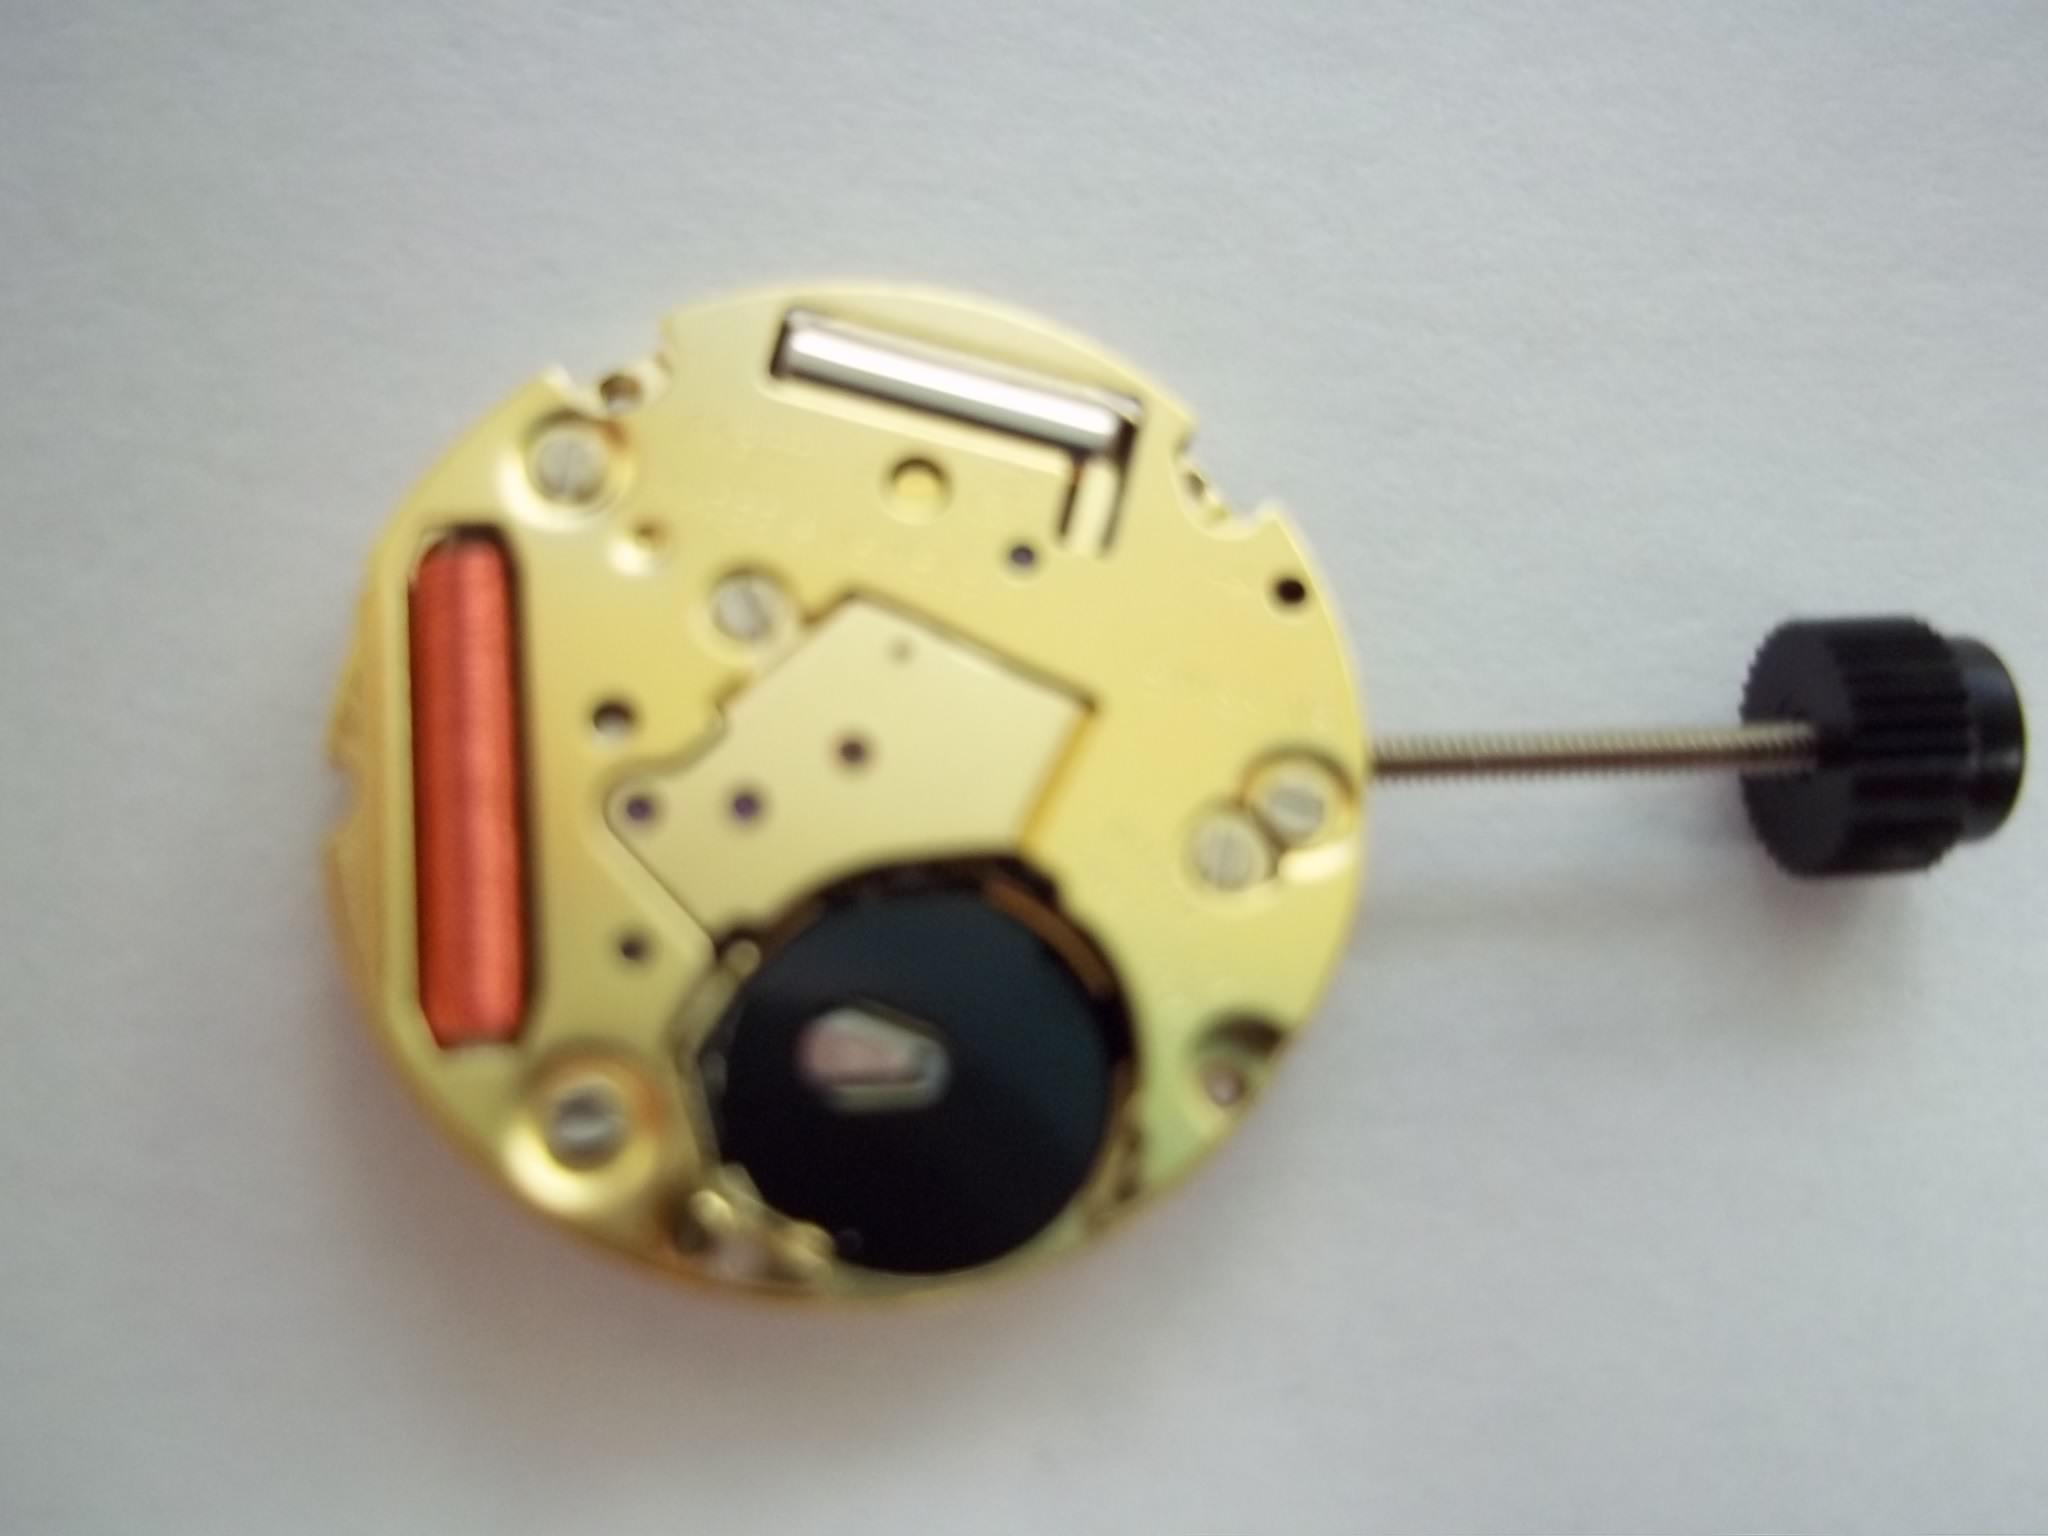 ETA F03.111 Quartz Watch Movement